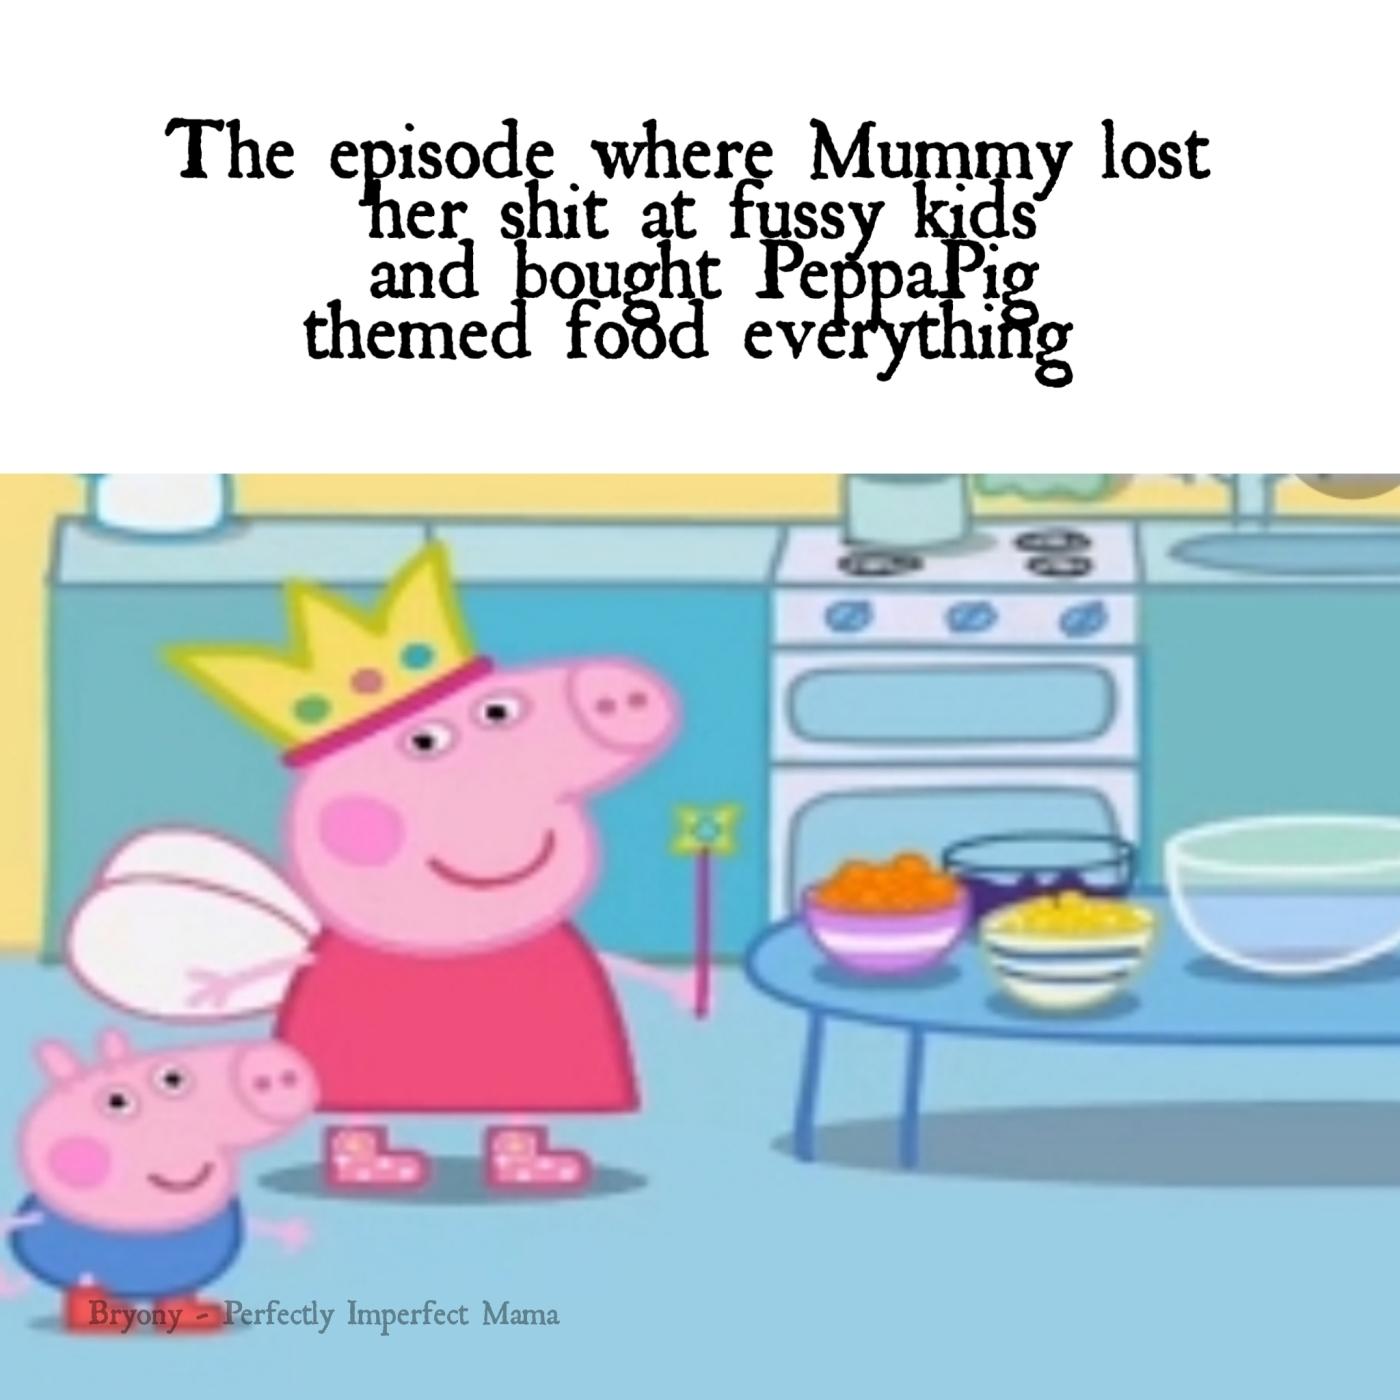 peppa pig themed food